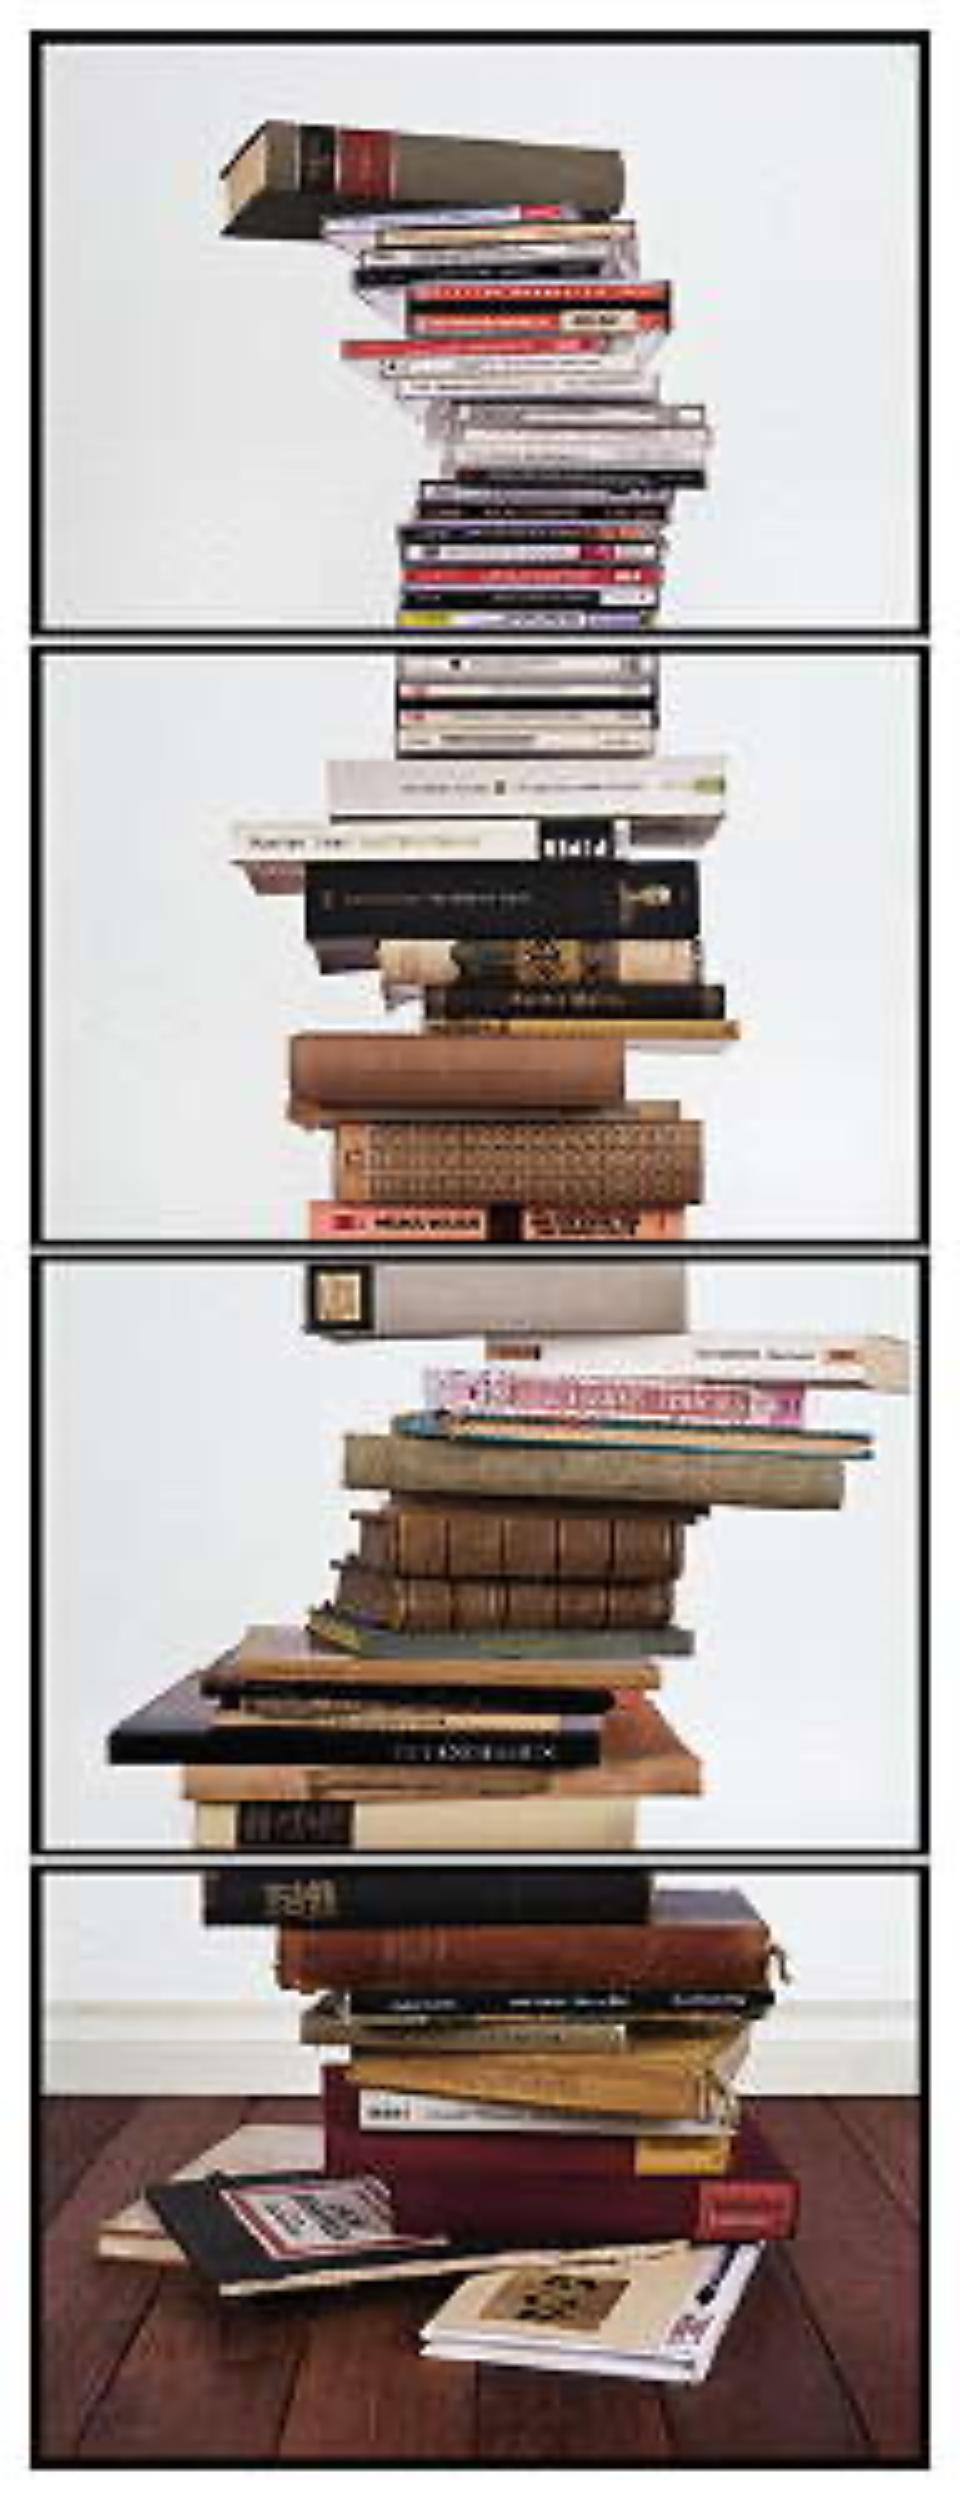 Joachim Froese: Critical Mass #6 2008 4 archival pigment inkjet prints 124 x 46 cm Ed. 12